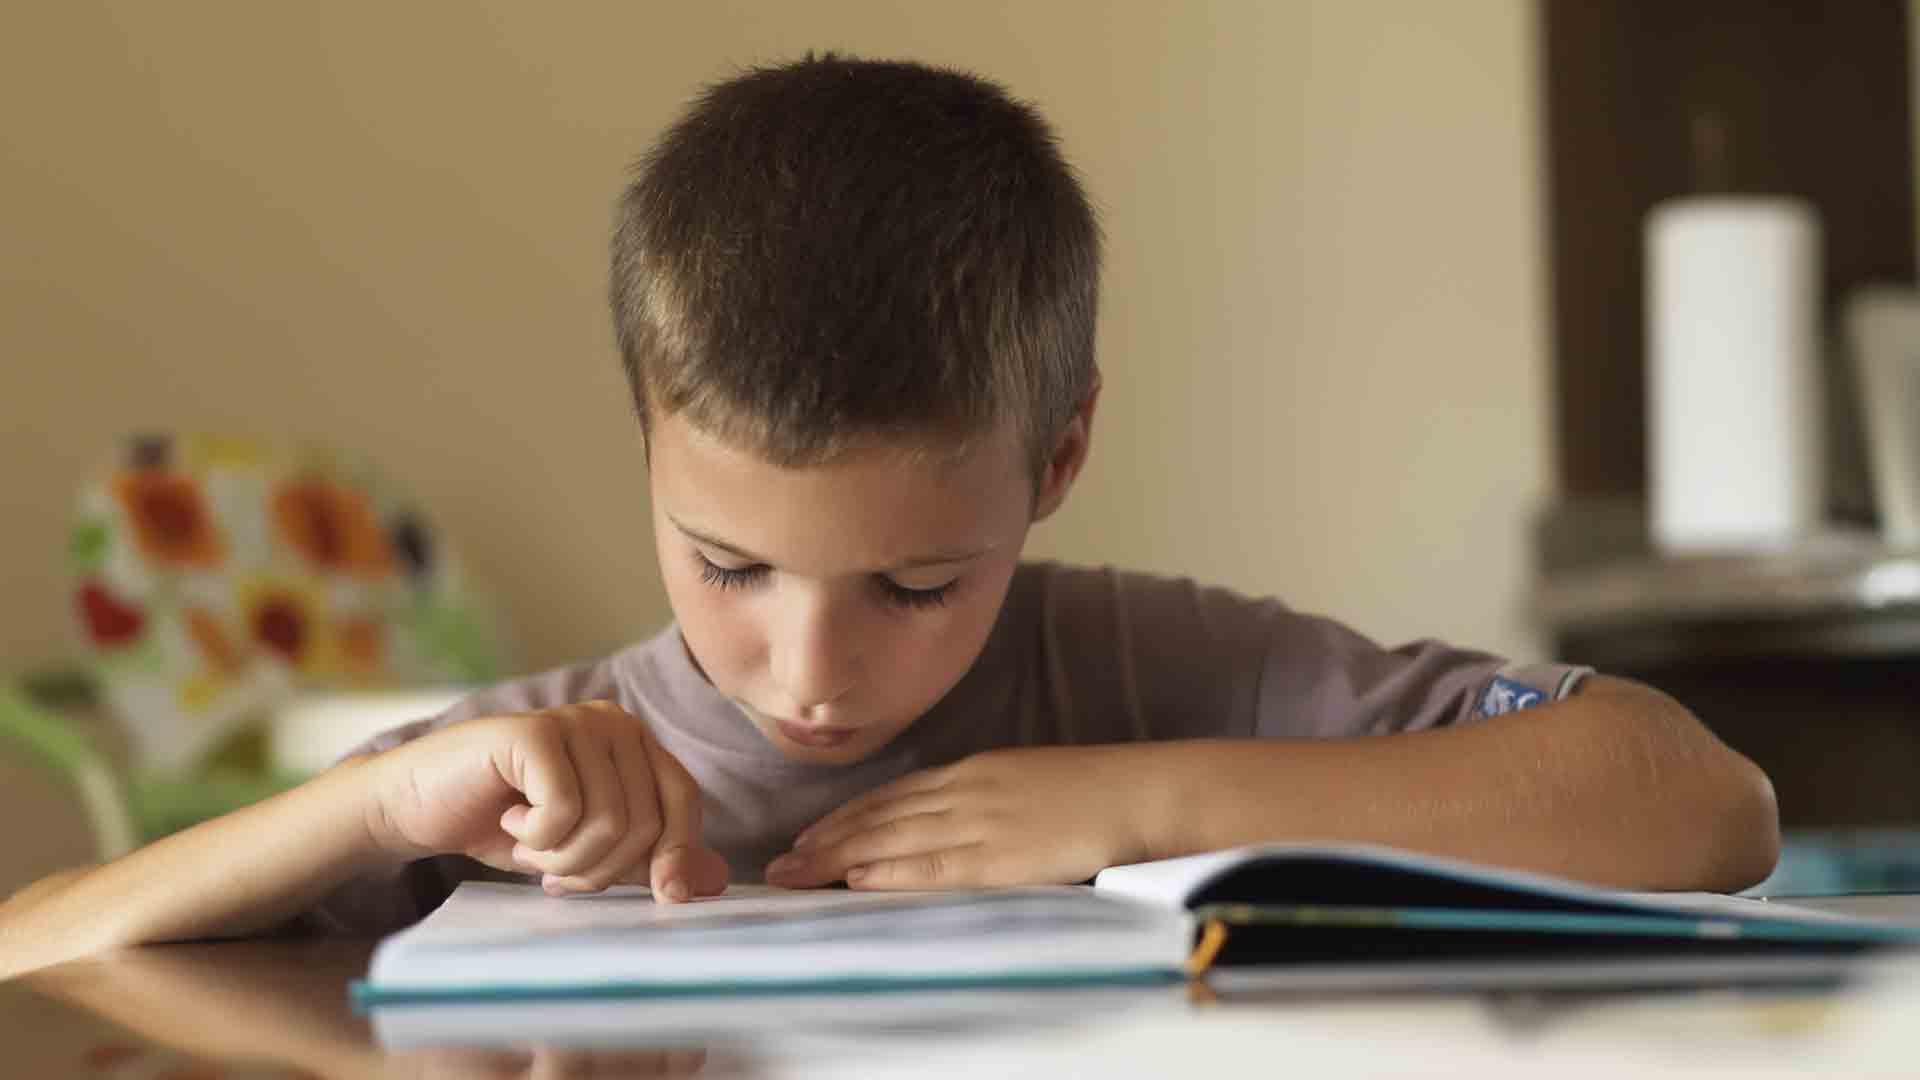 The Dialogue Surrounding Dyslexia: Five Important Takeaways